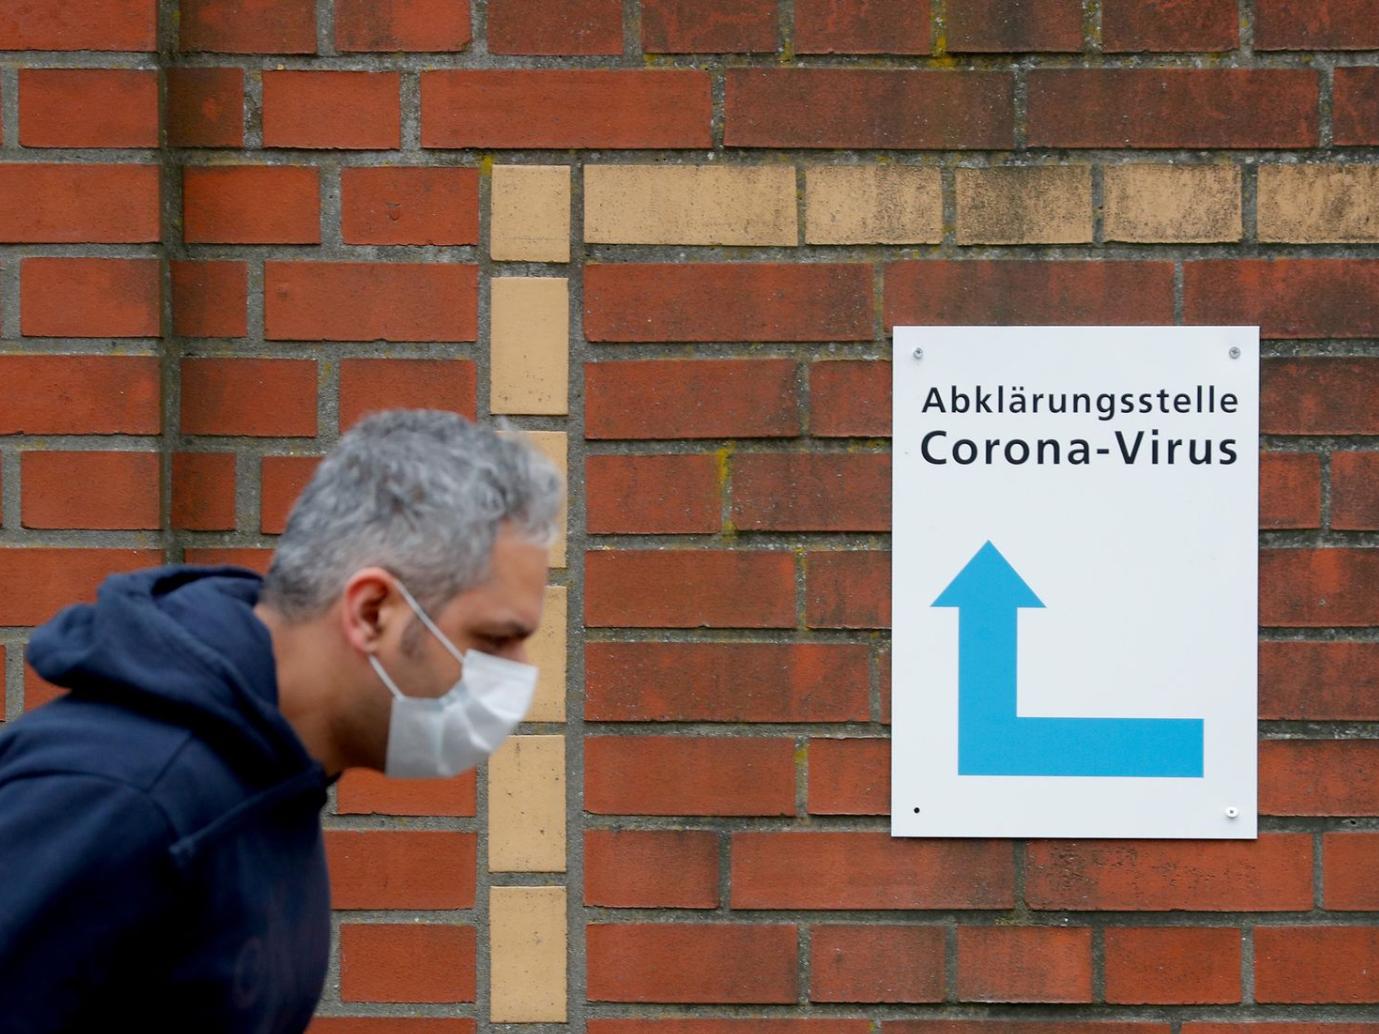 Face masks becoming mandatory across Germany